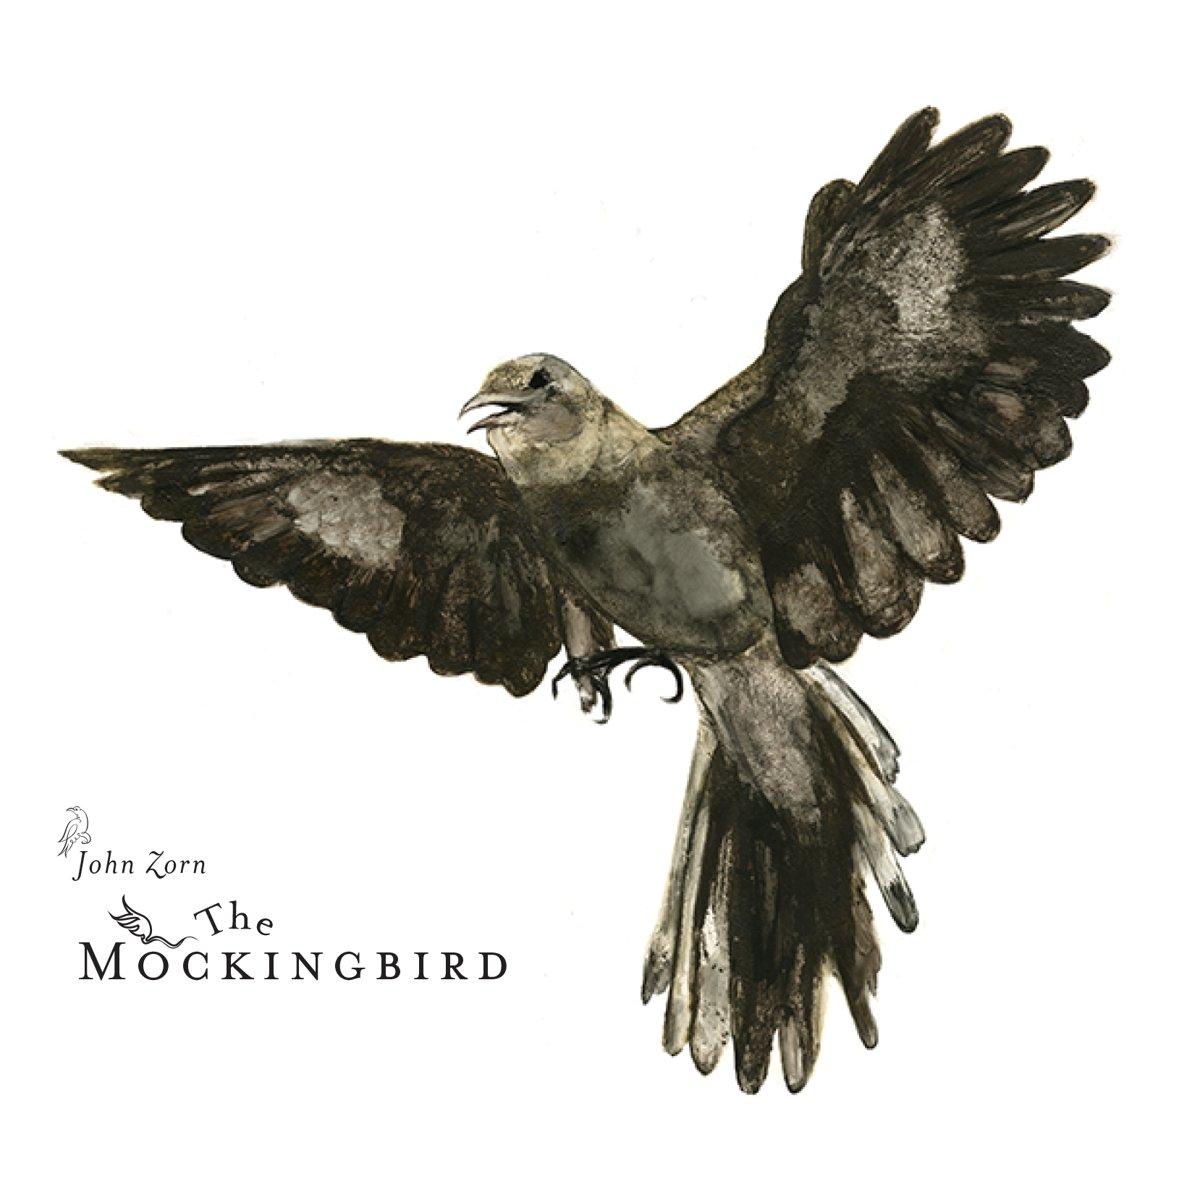 john zorn carol emanuel bill frisell kenny wollesen mockingbird amazoncom music - Mocking Bird Download